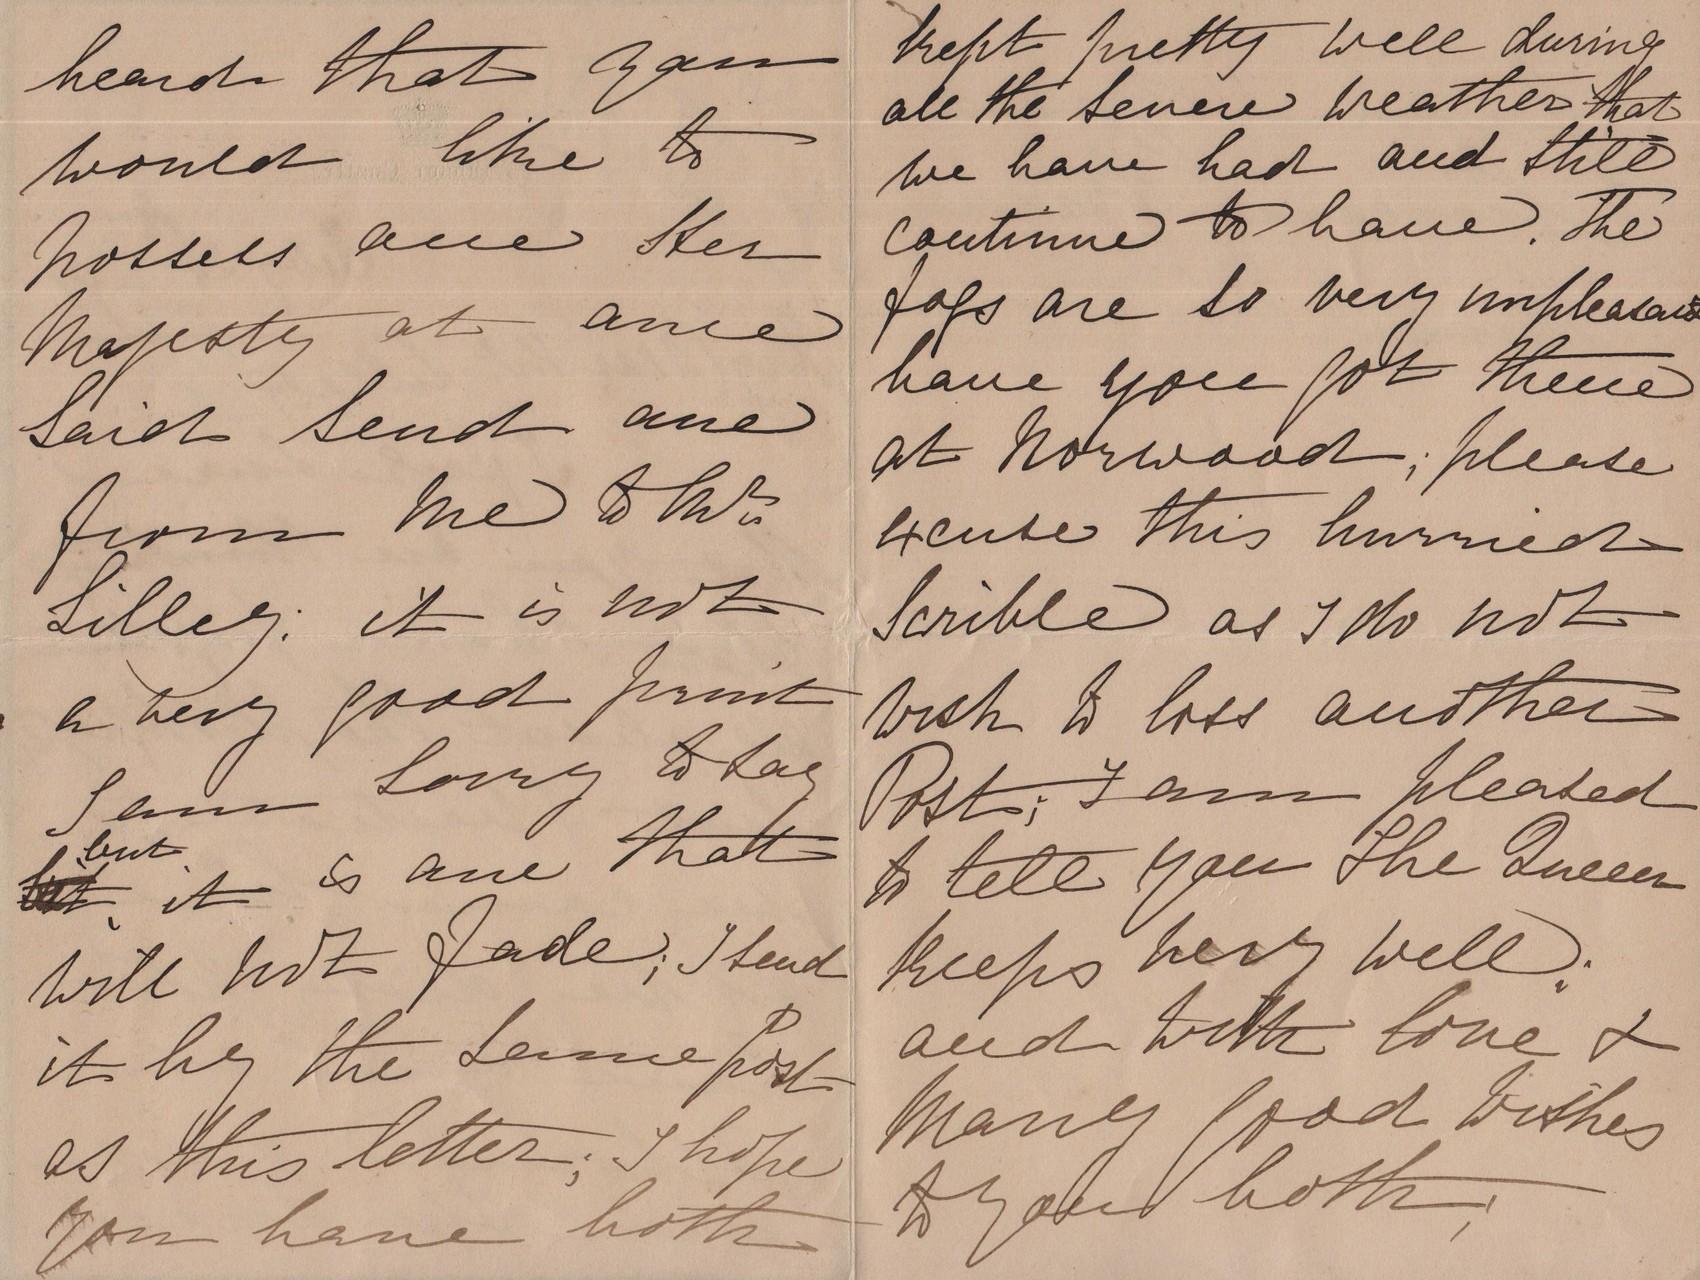 1891 February 21st JHL to AMcD